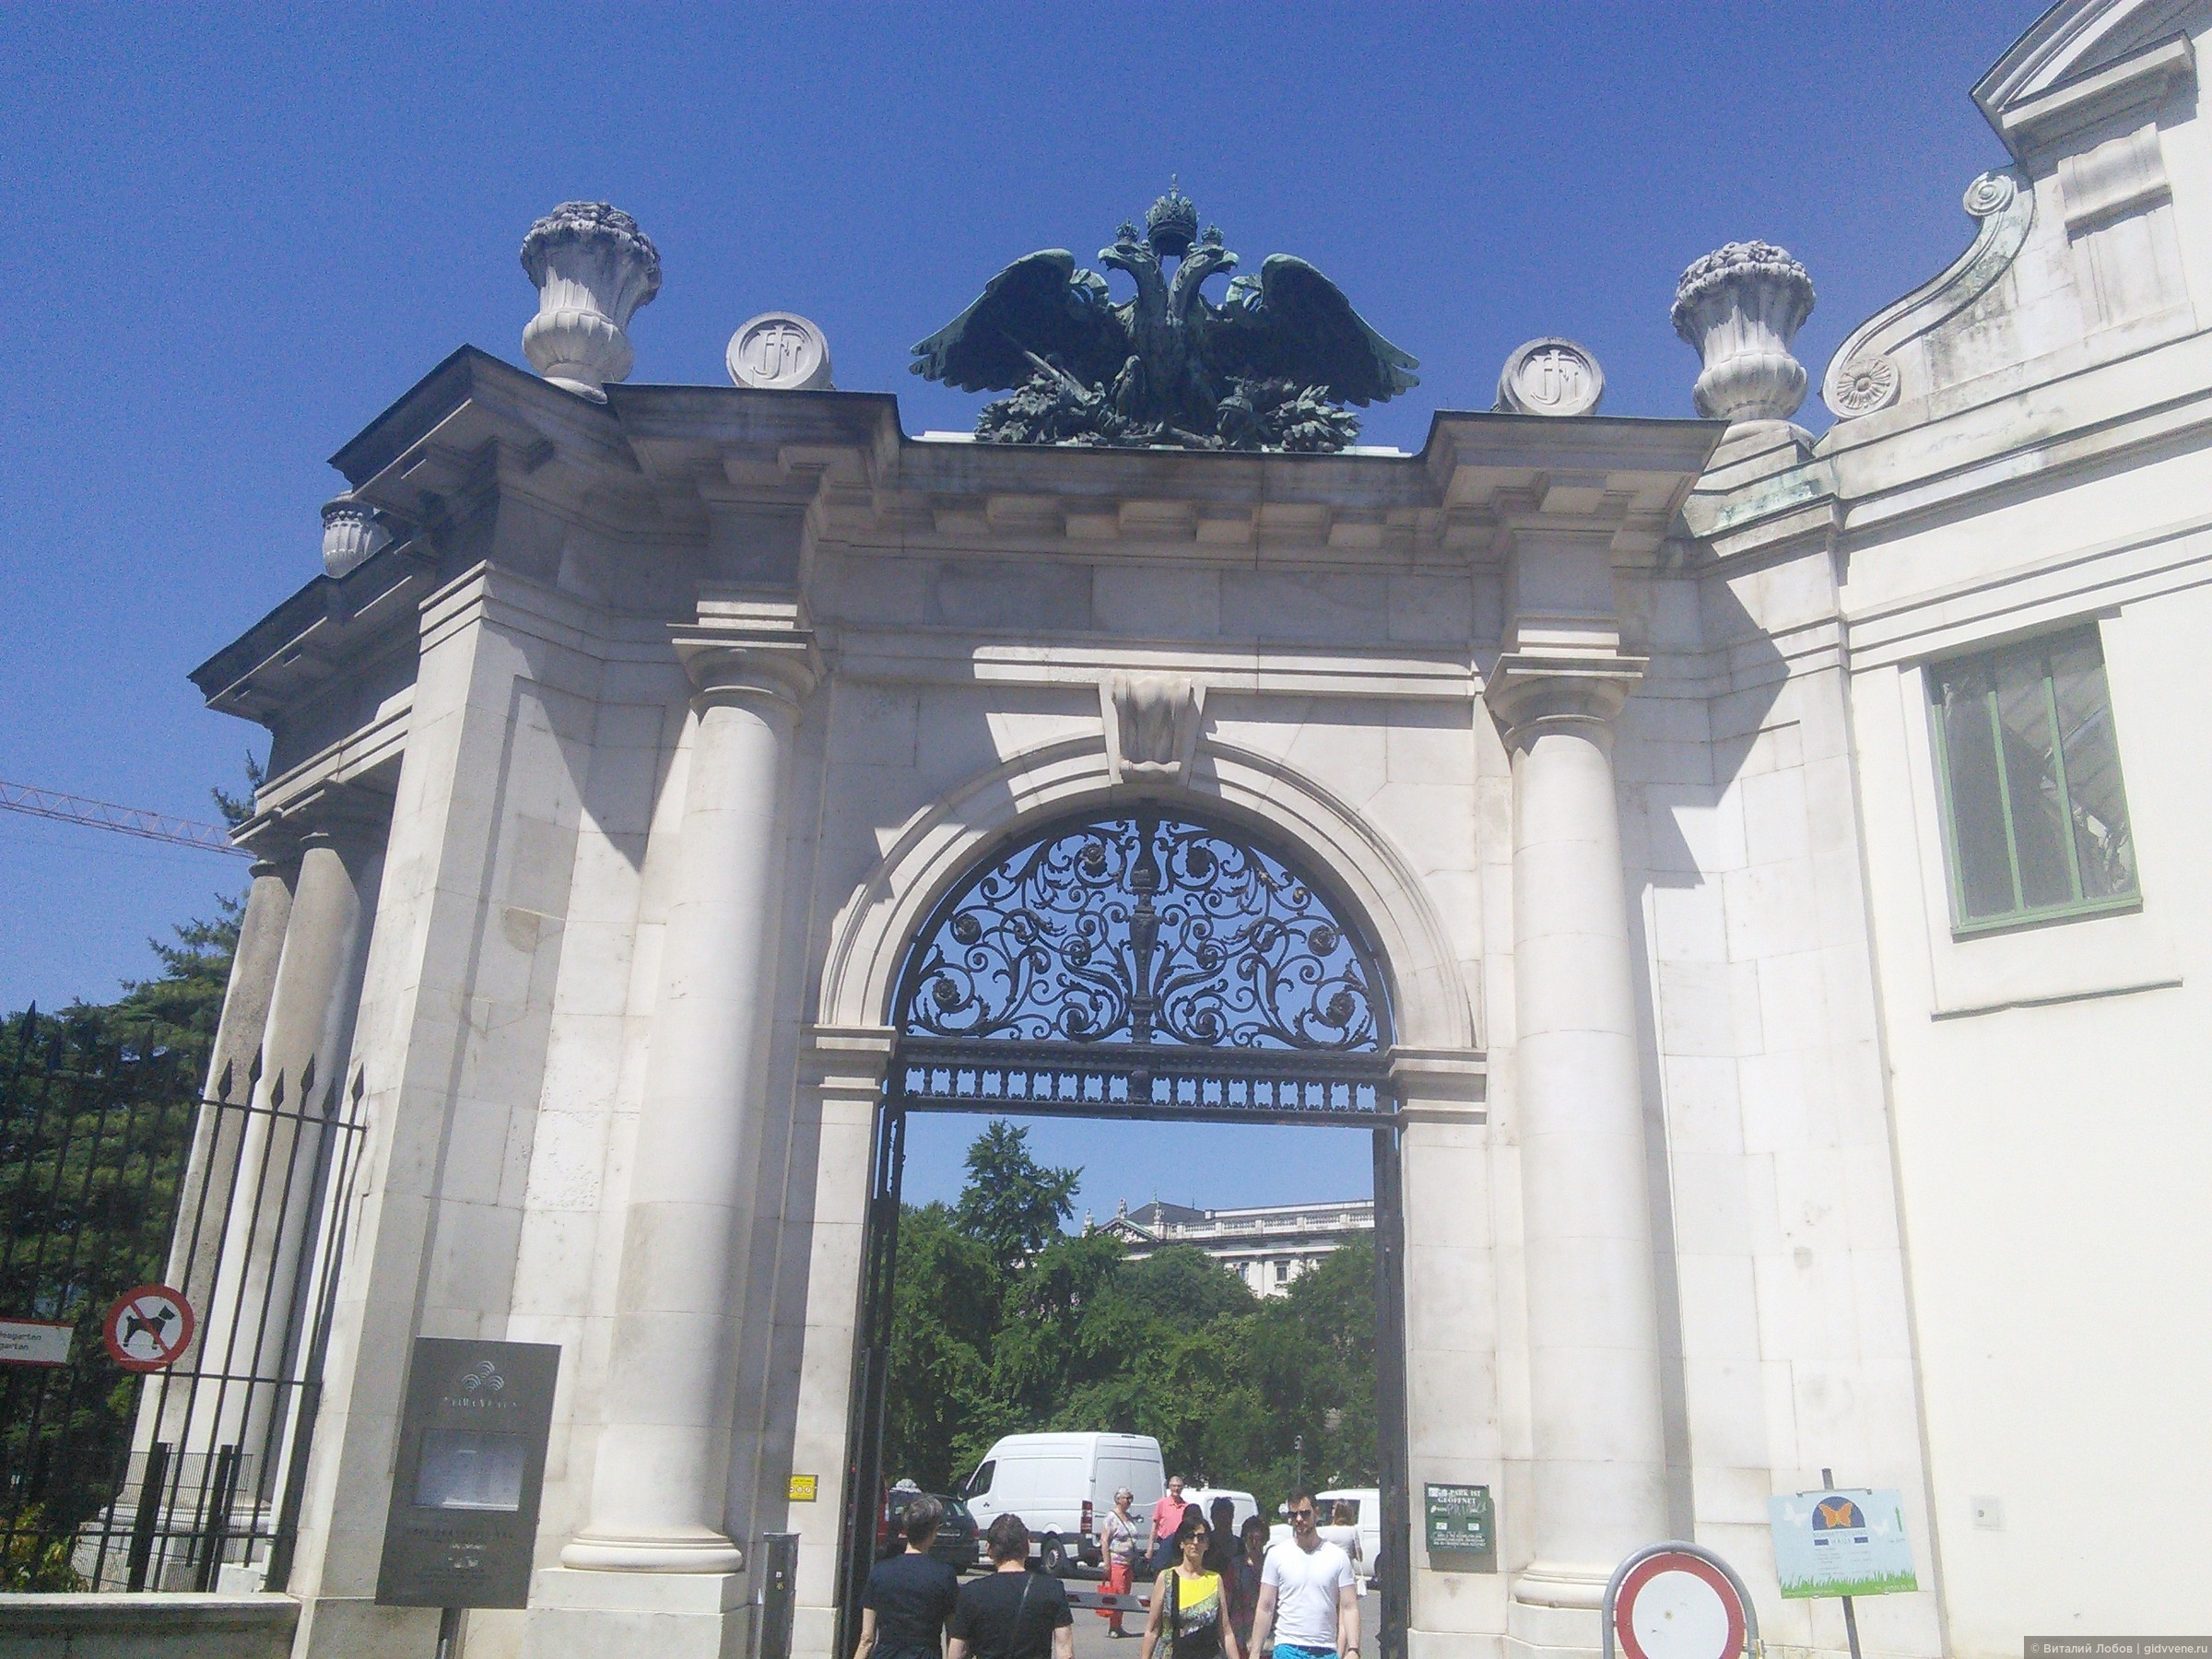 "Фото из альбома ""Бурггартен"", Вена, Австрия"